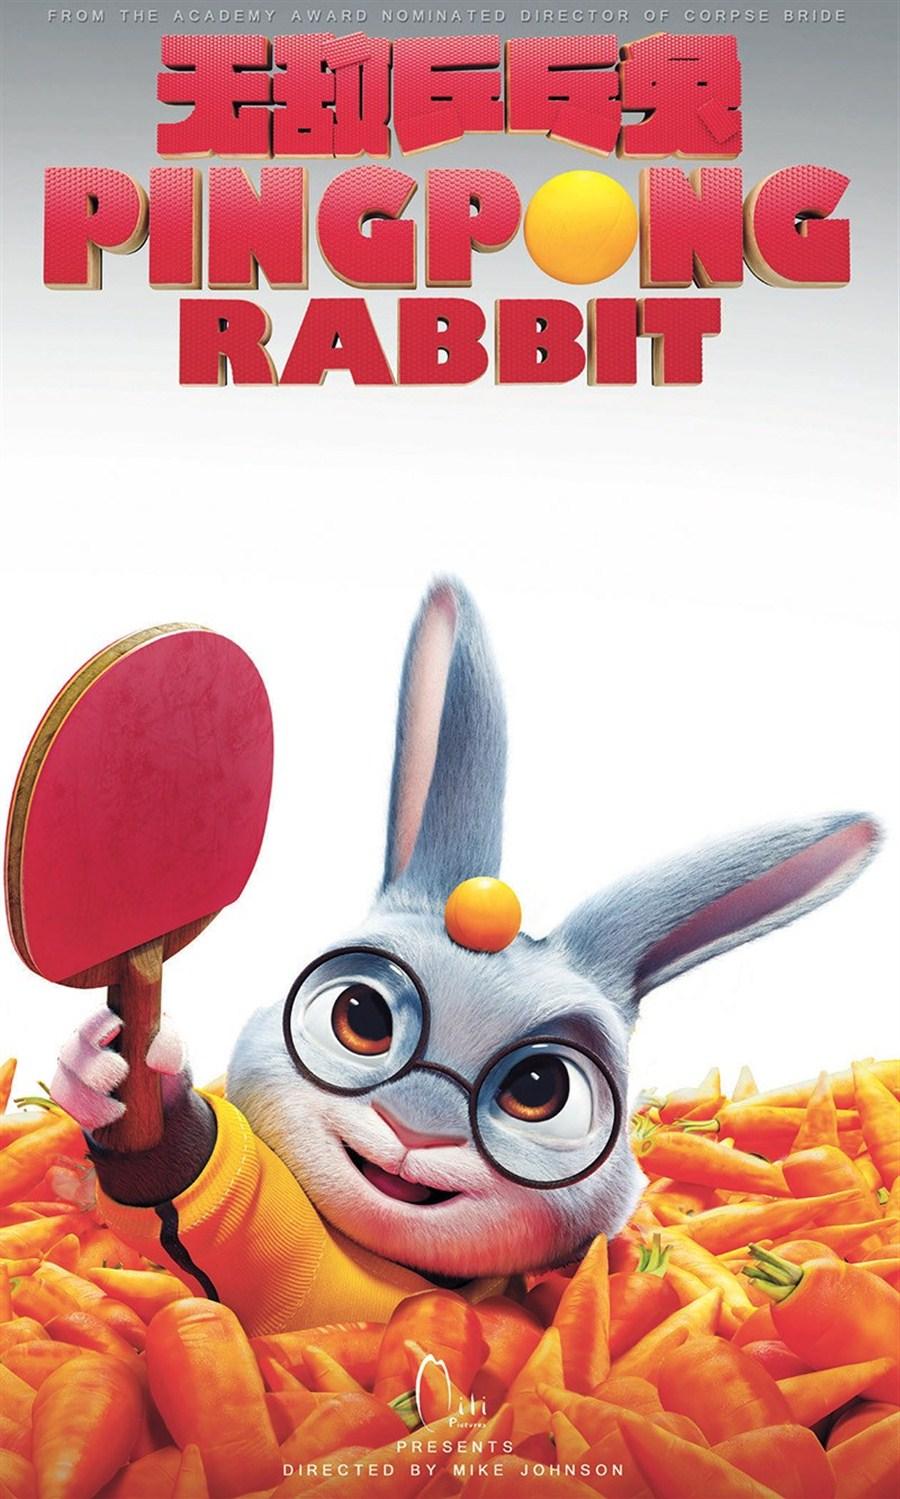 دانلود انیمیشن خرگوش پینگ پنگ Ping Pong Rabbit 2016